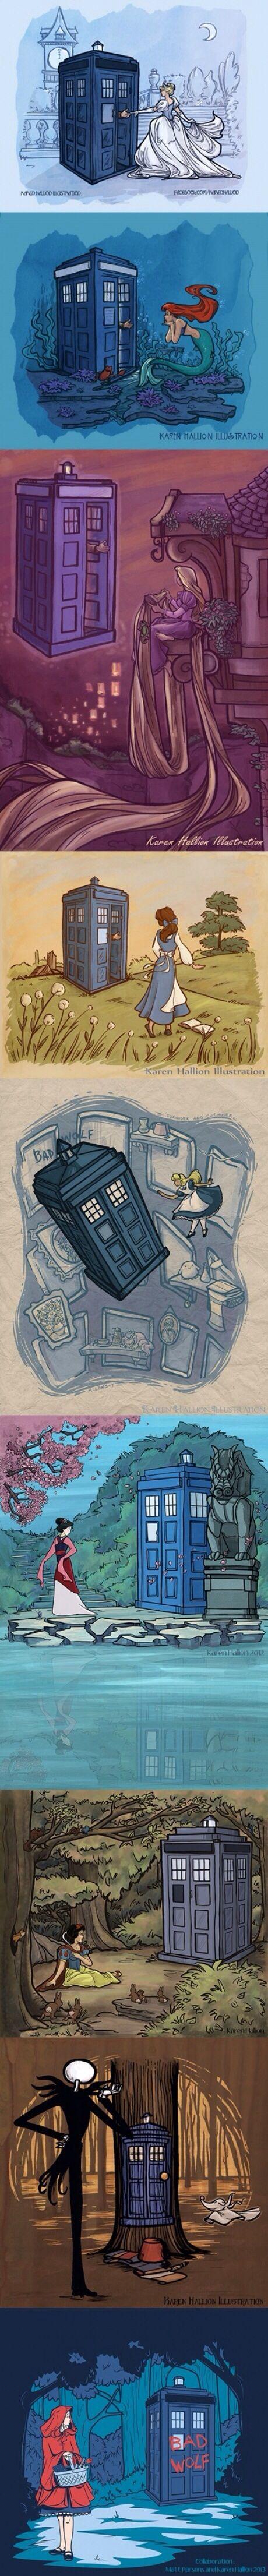 Disney fairy tales plus the Doctor